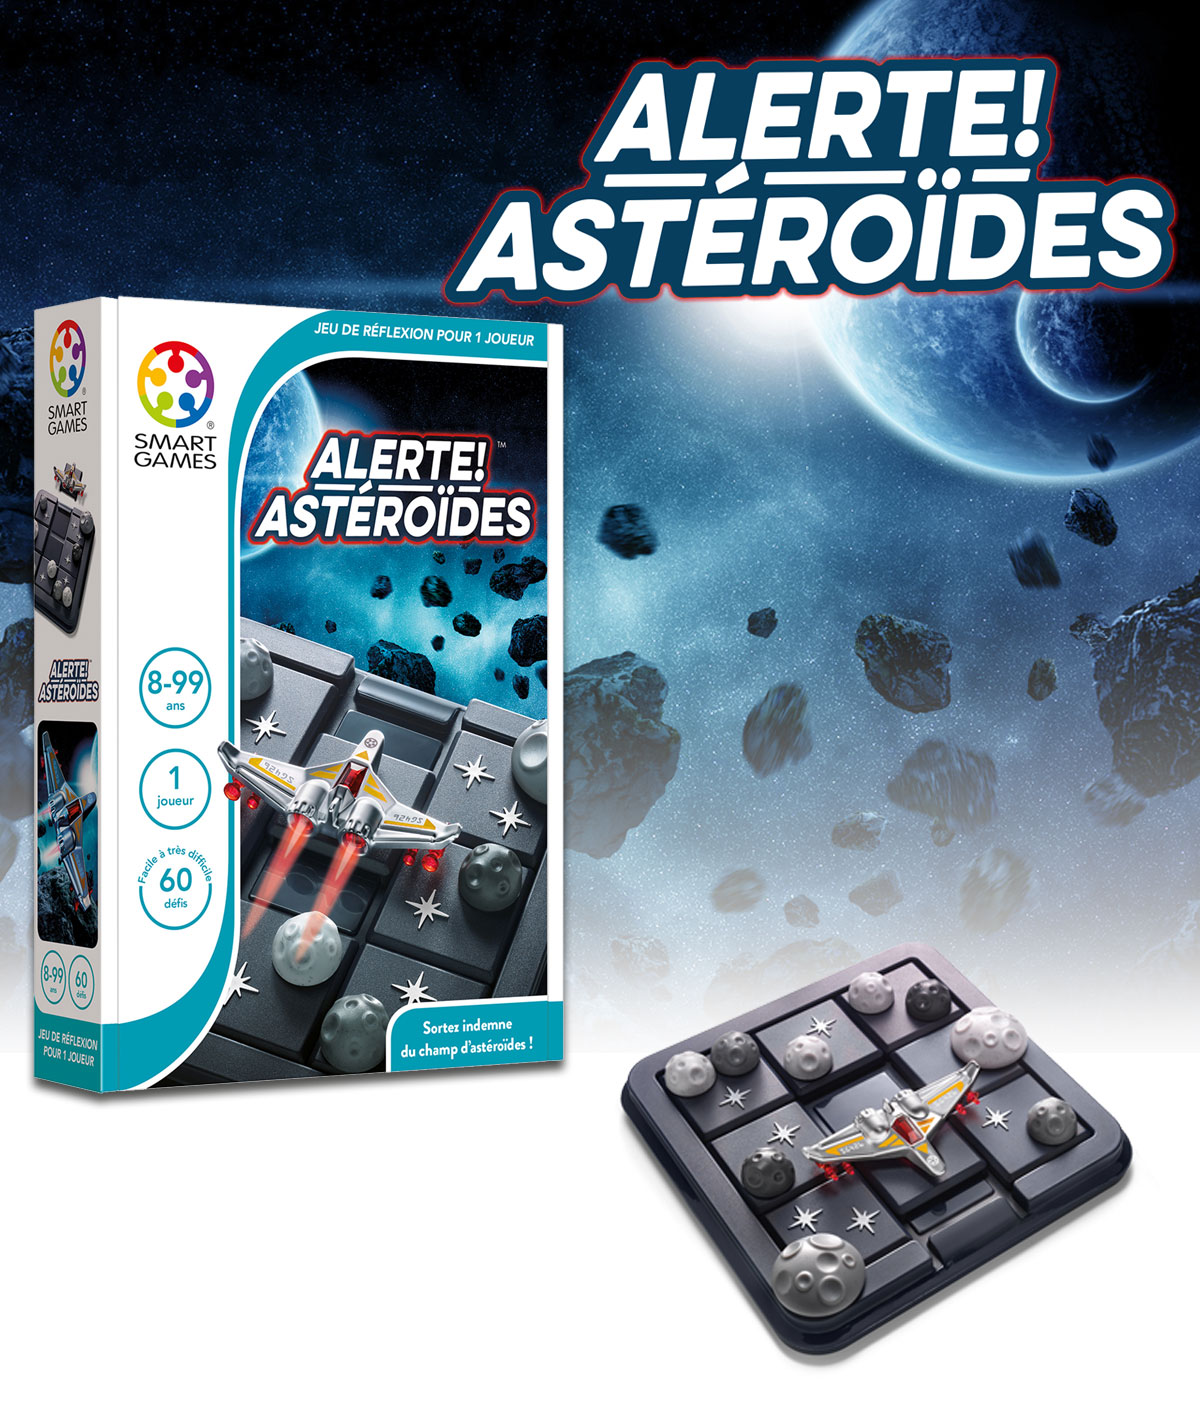 Alerte! Astéroïdes